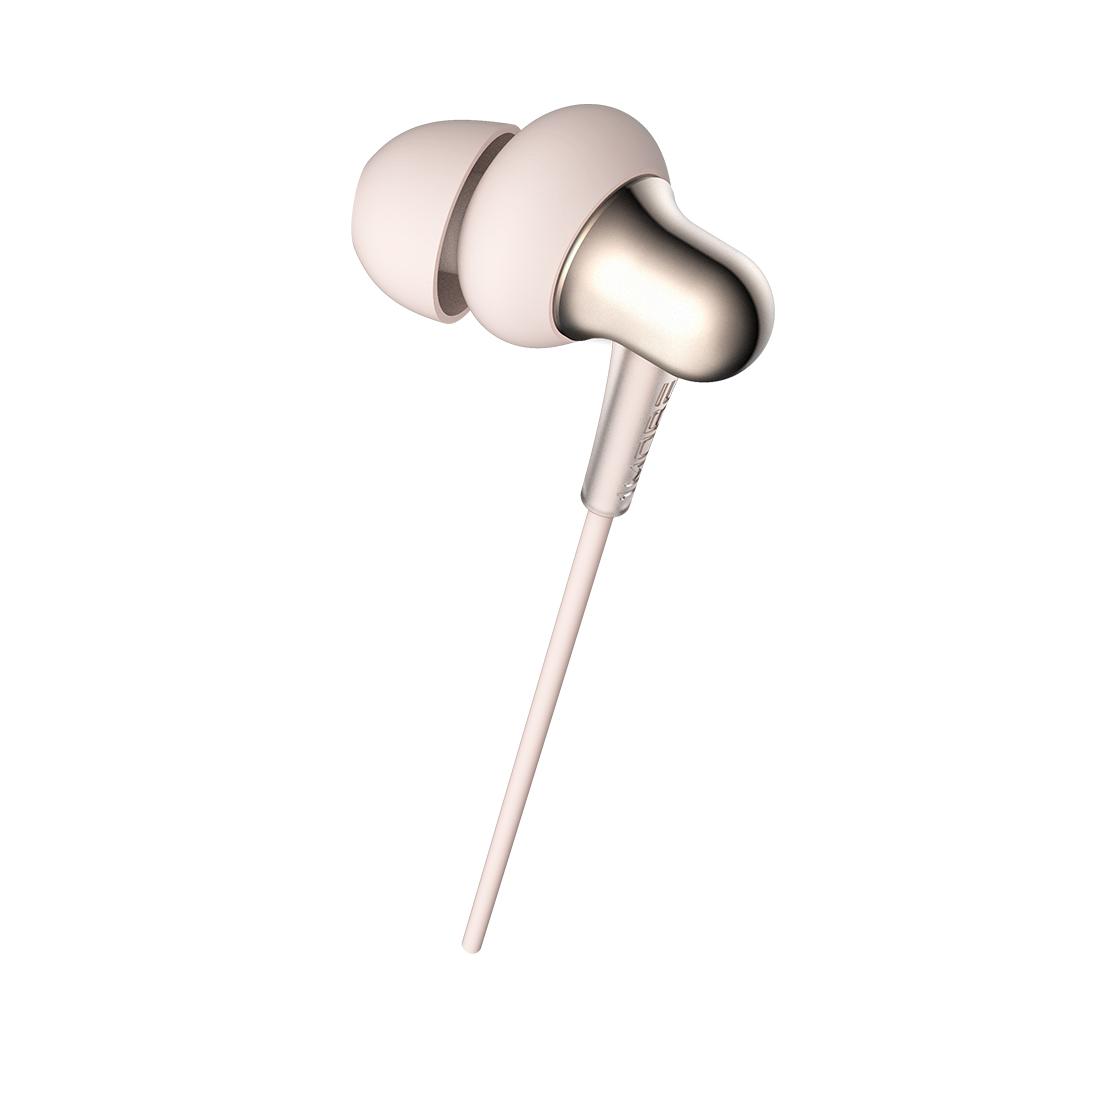 Наушники 1More Stylish Dual-dynamic Driver In-Ear Headphones E1025 Золотой